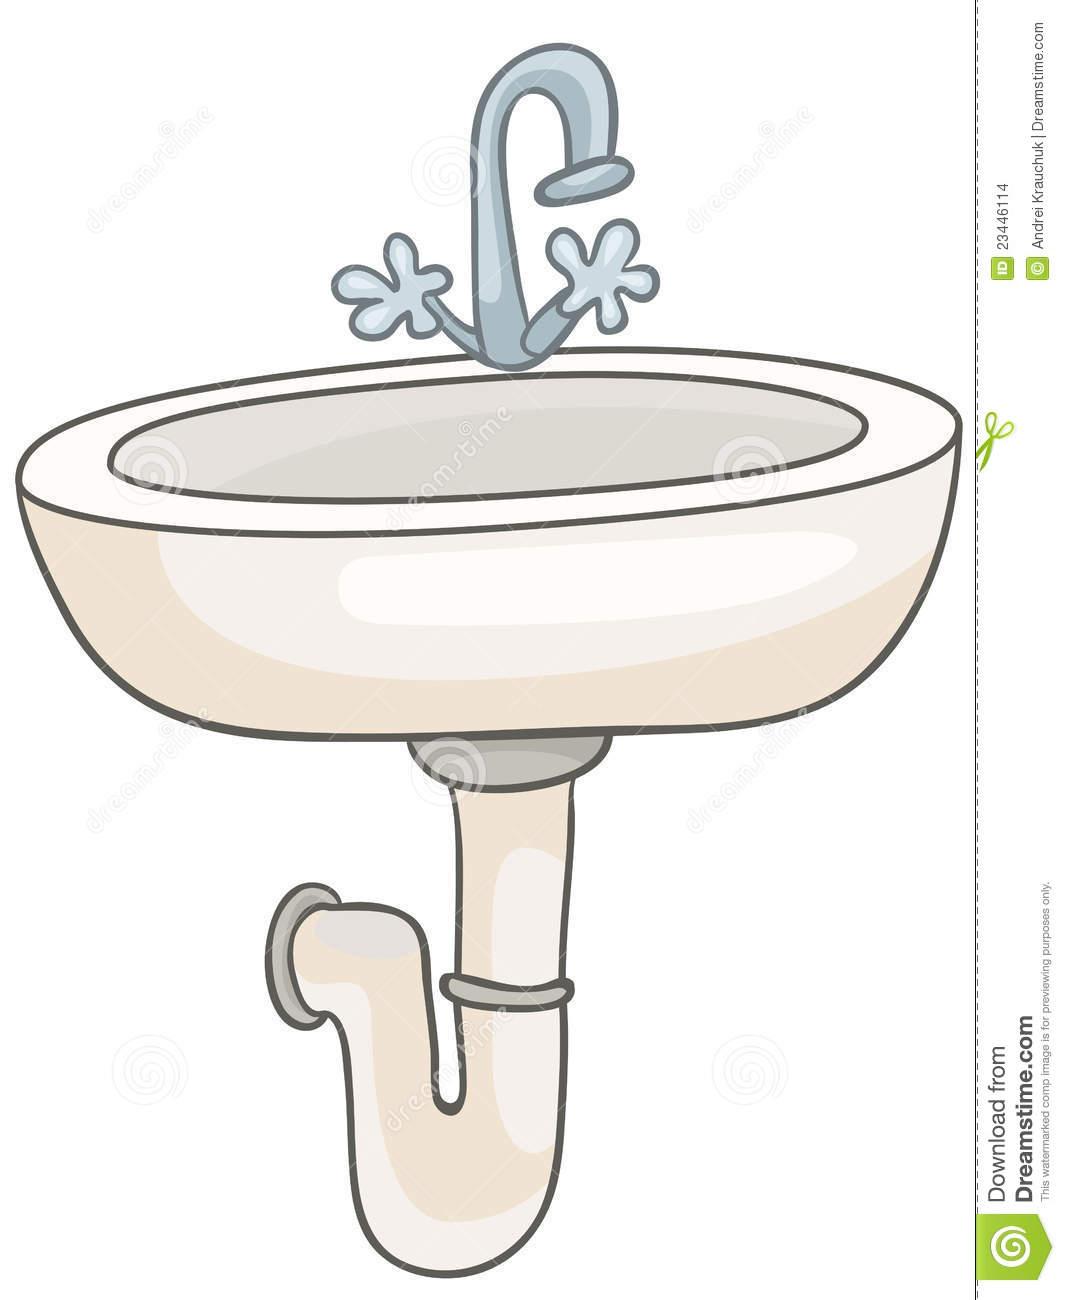 Bathroom clipart washbasin Clipart  Furniture Images Sink